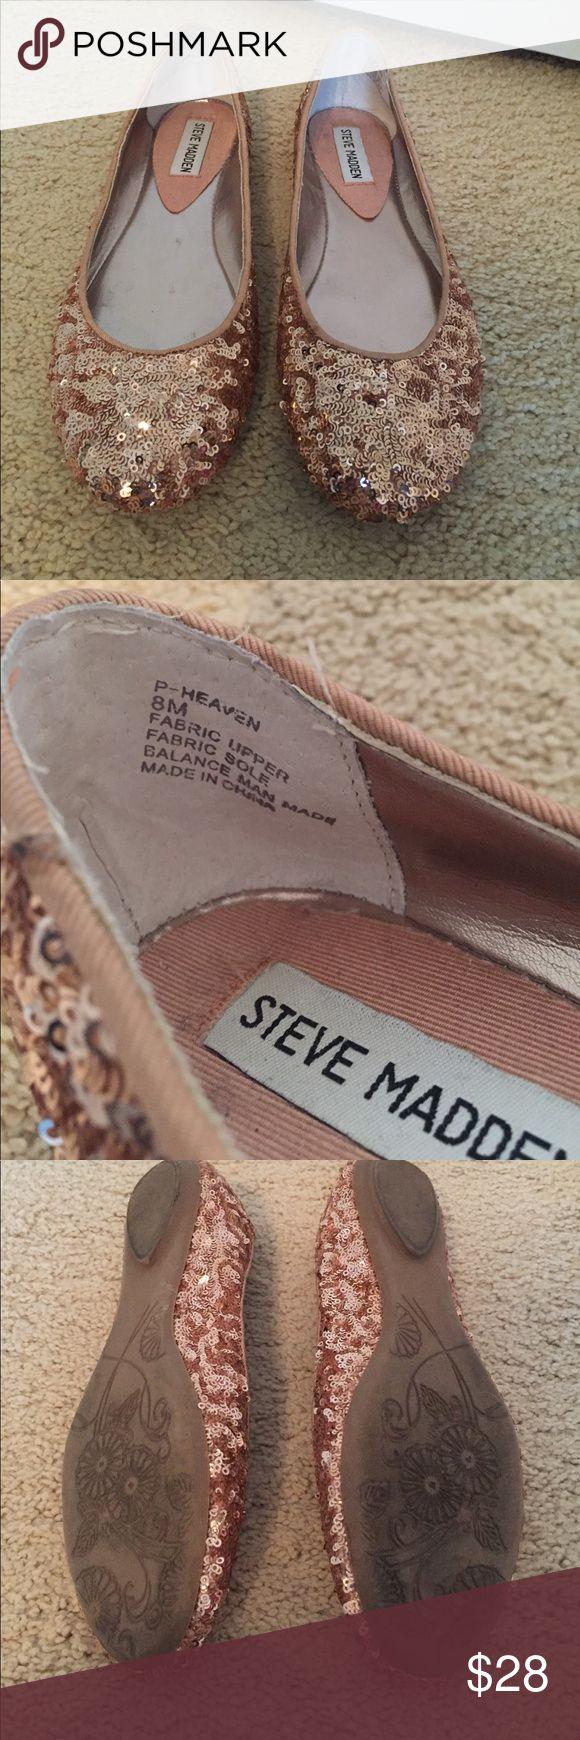 Steve Madden blush sequined flats, size 8M Steve Madden blush sequined flats, size 8M. Steve Madden Shoes Flats & Loafers